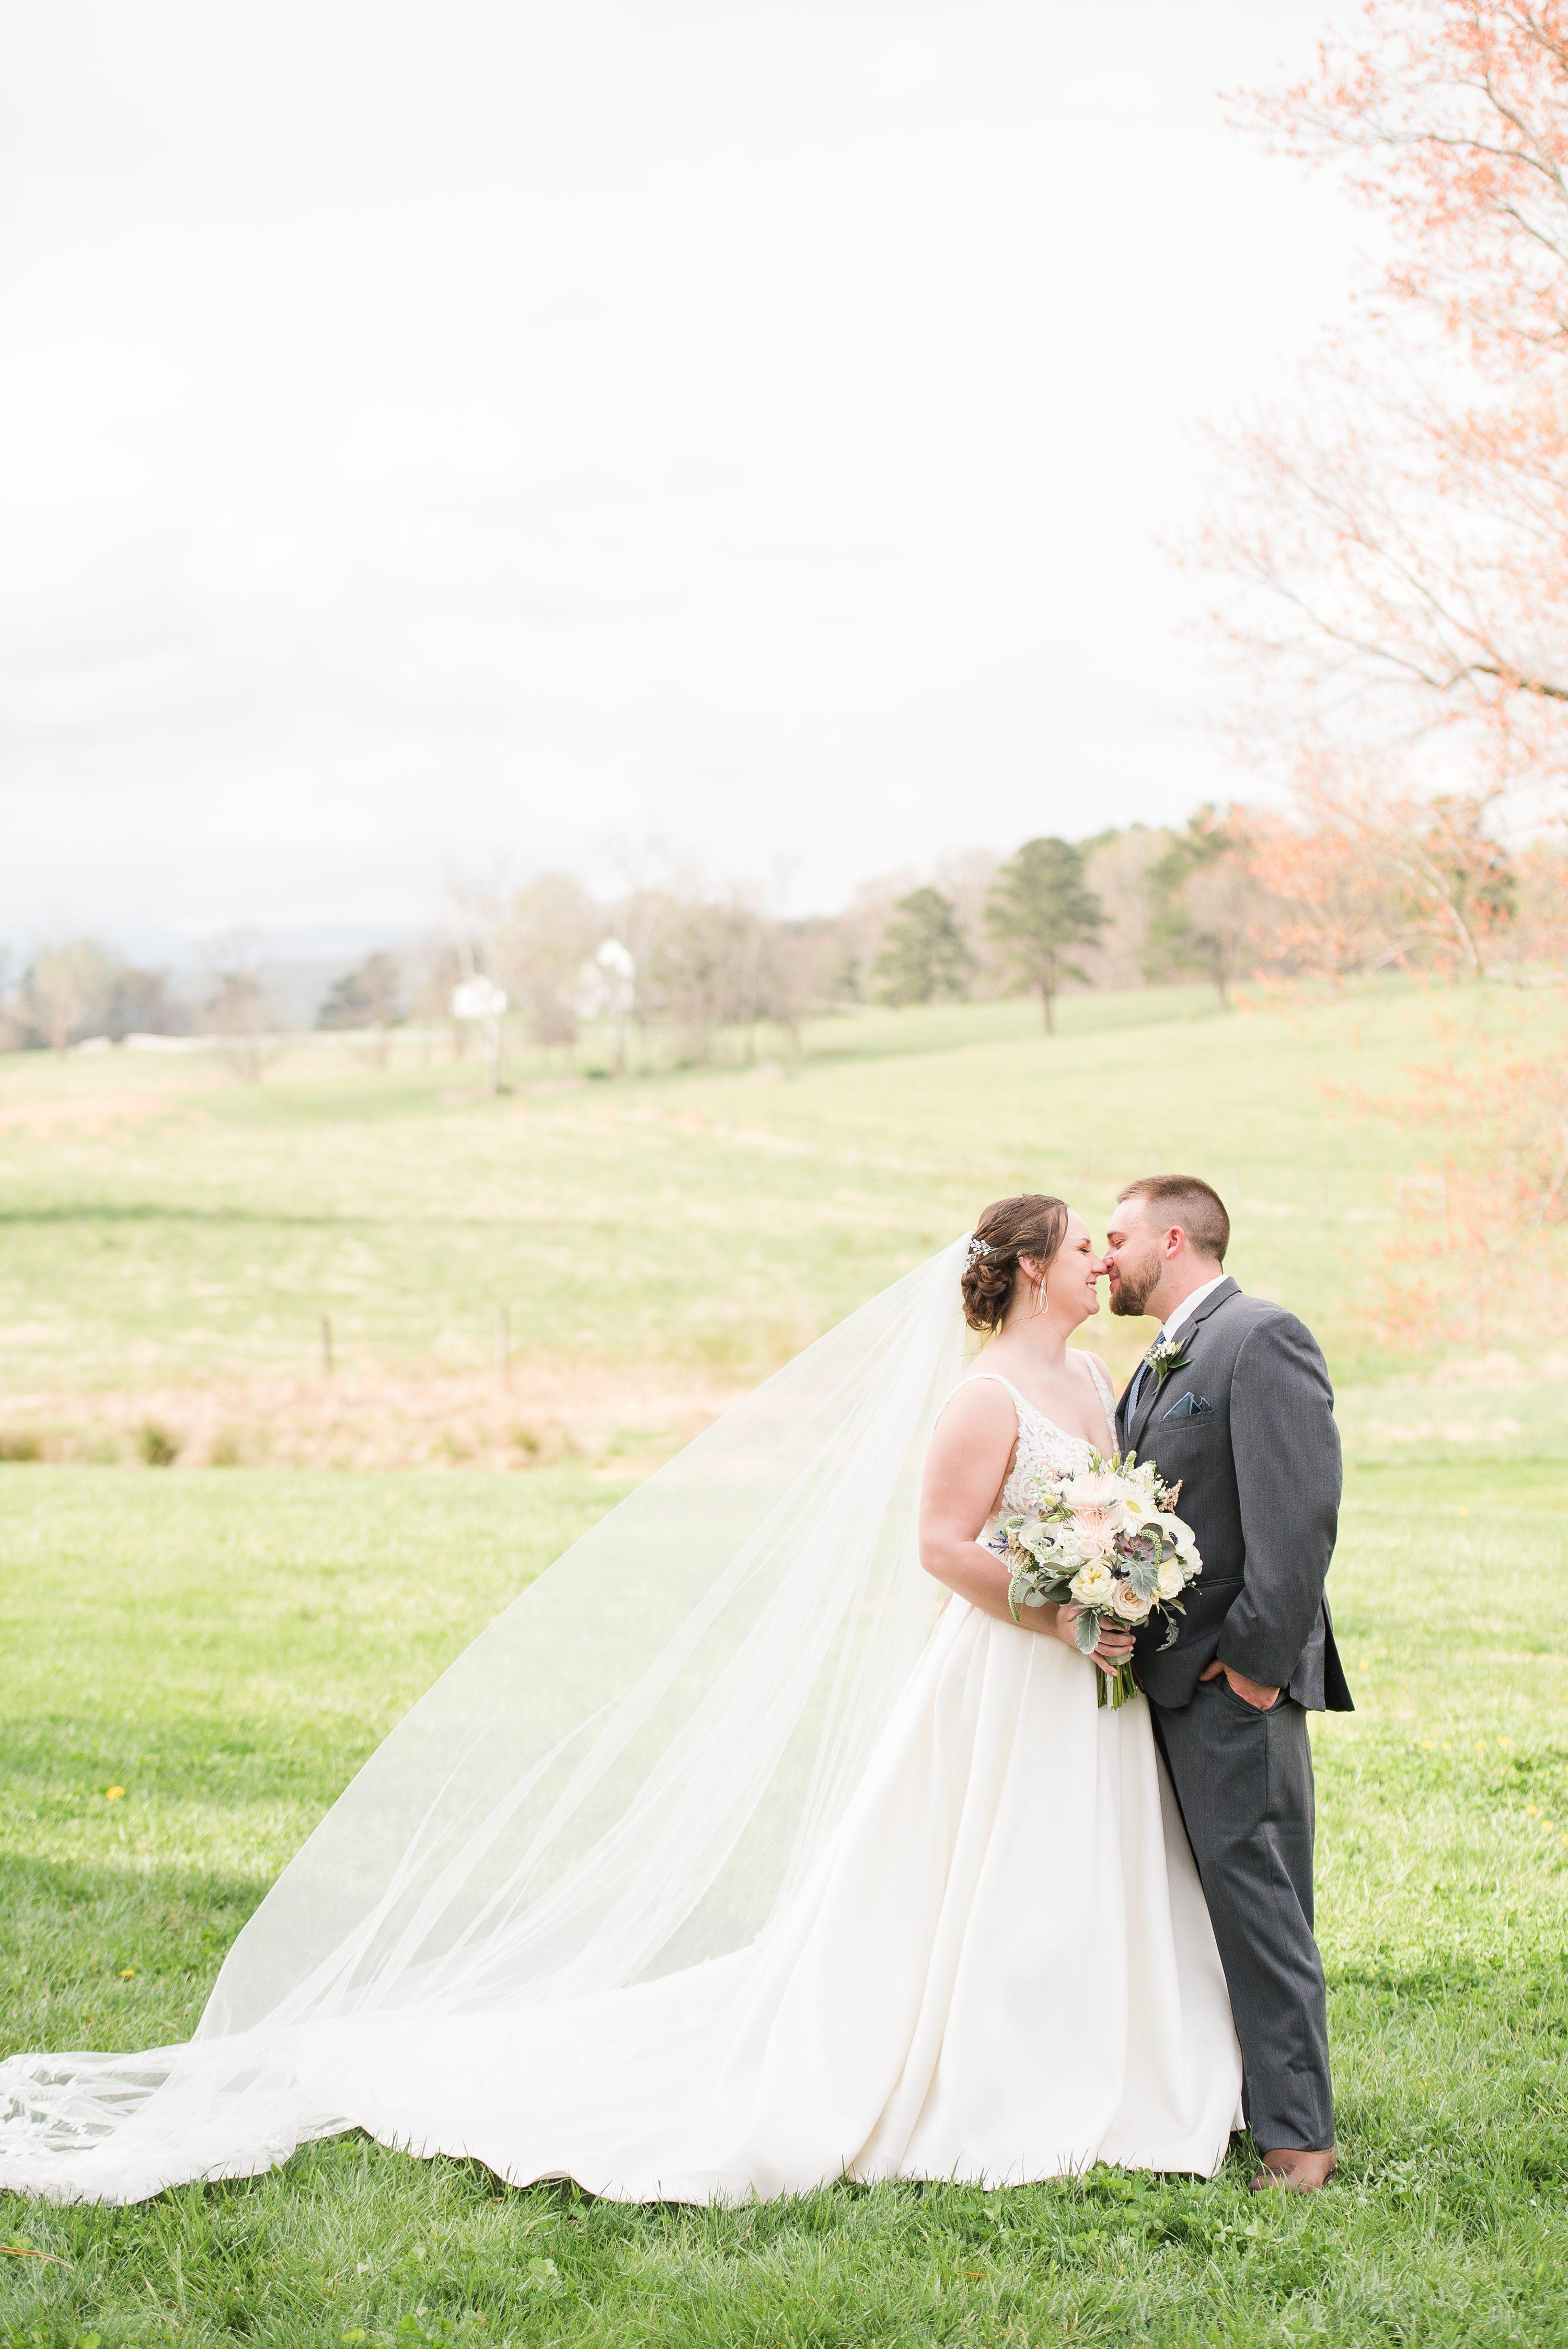 Charlottesville,Blue Ridge Mountains,bride and groom,mountain wedding,edgewood barn